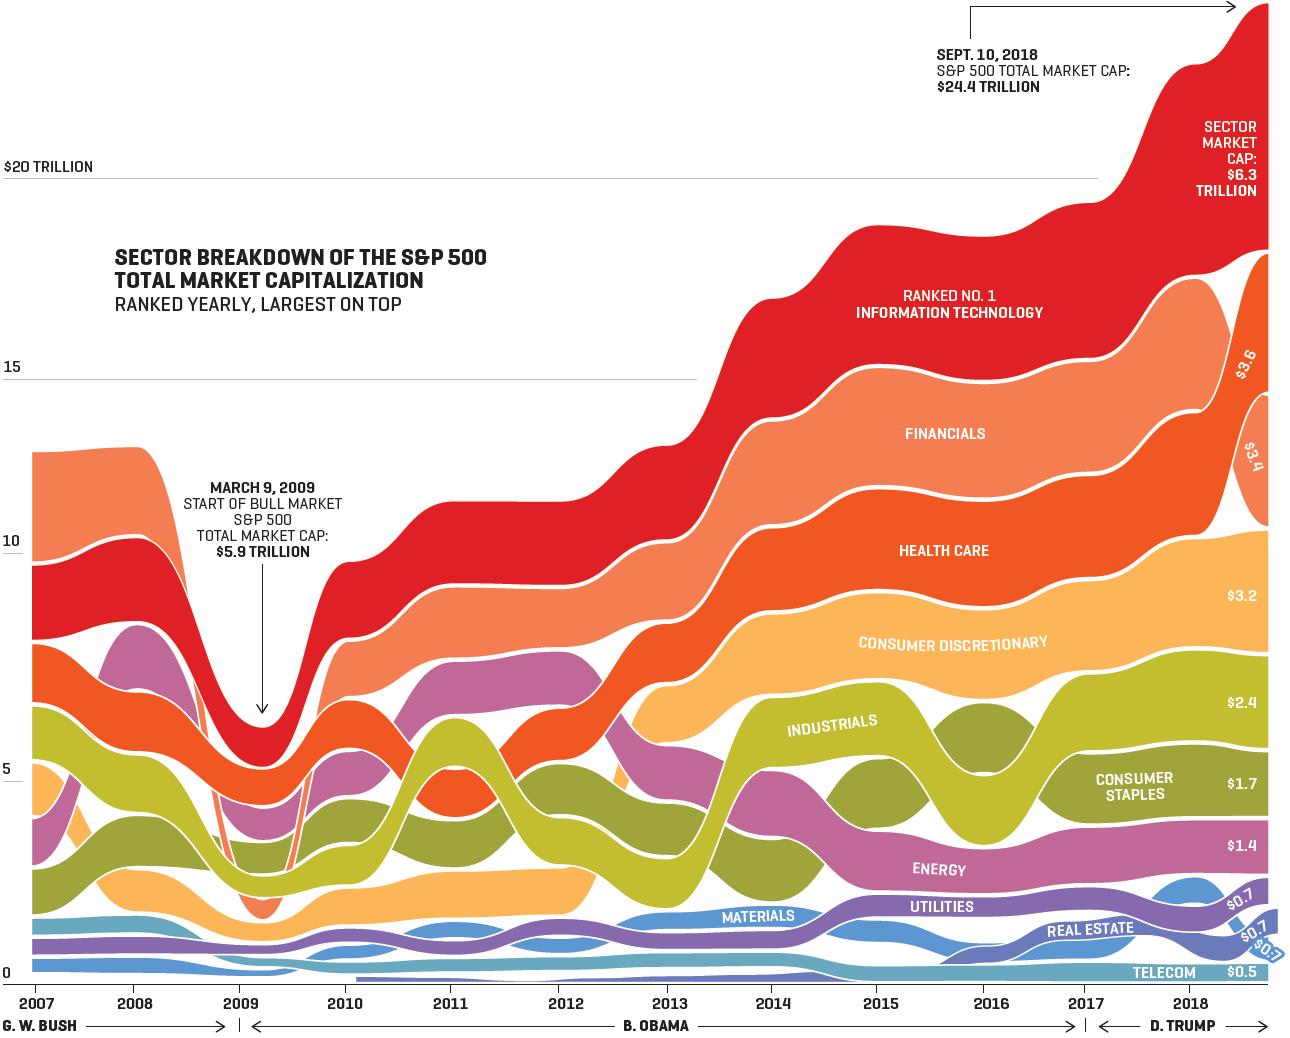 Anatomy Of A Bull Market Stock Market Marketing Data Visualization